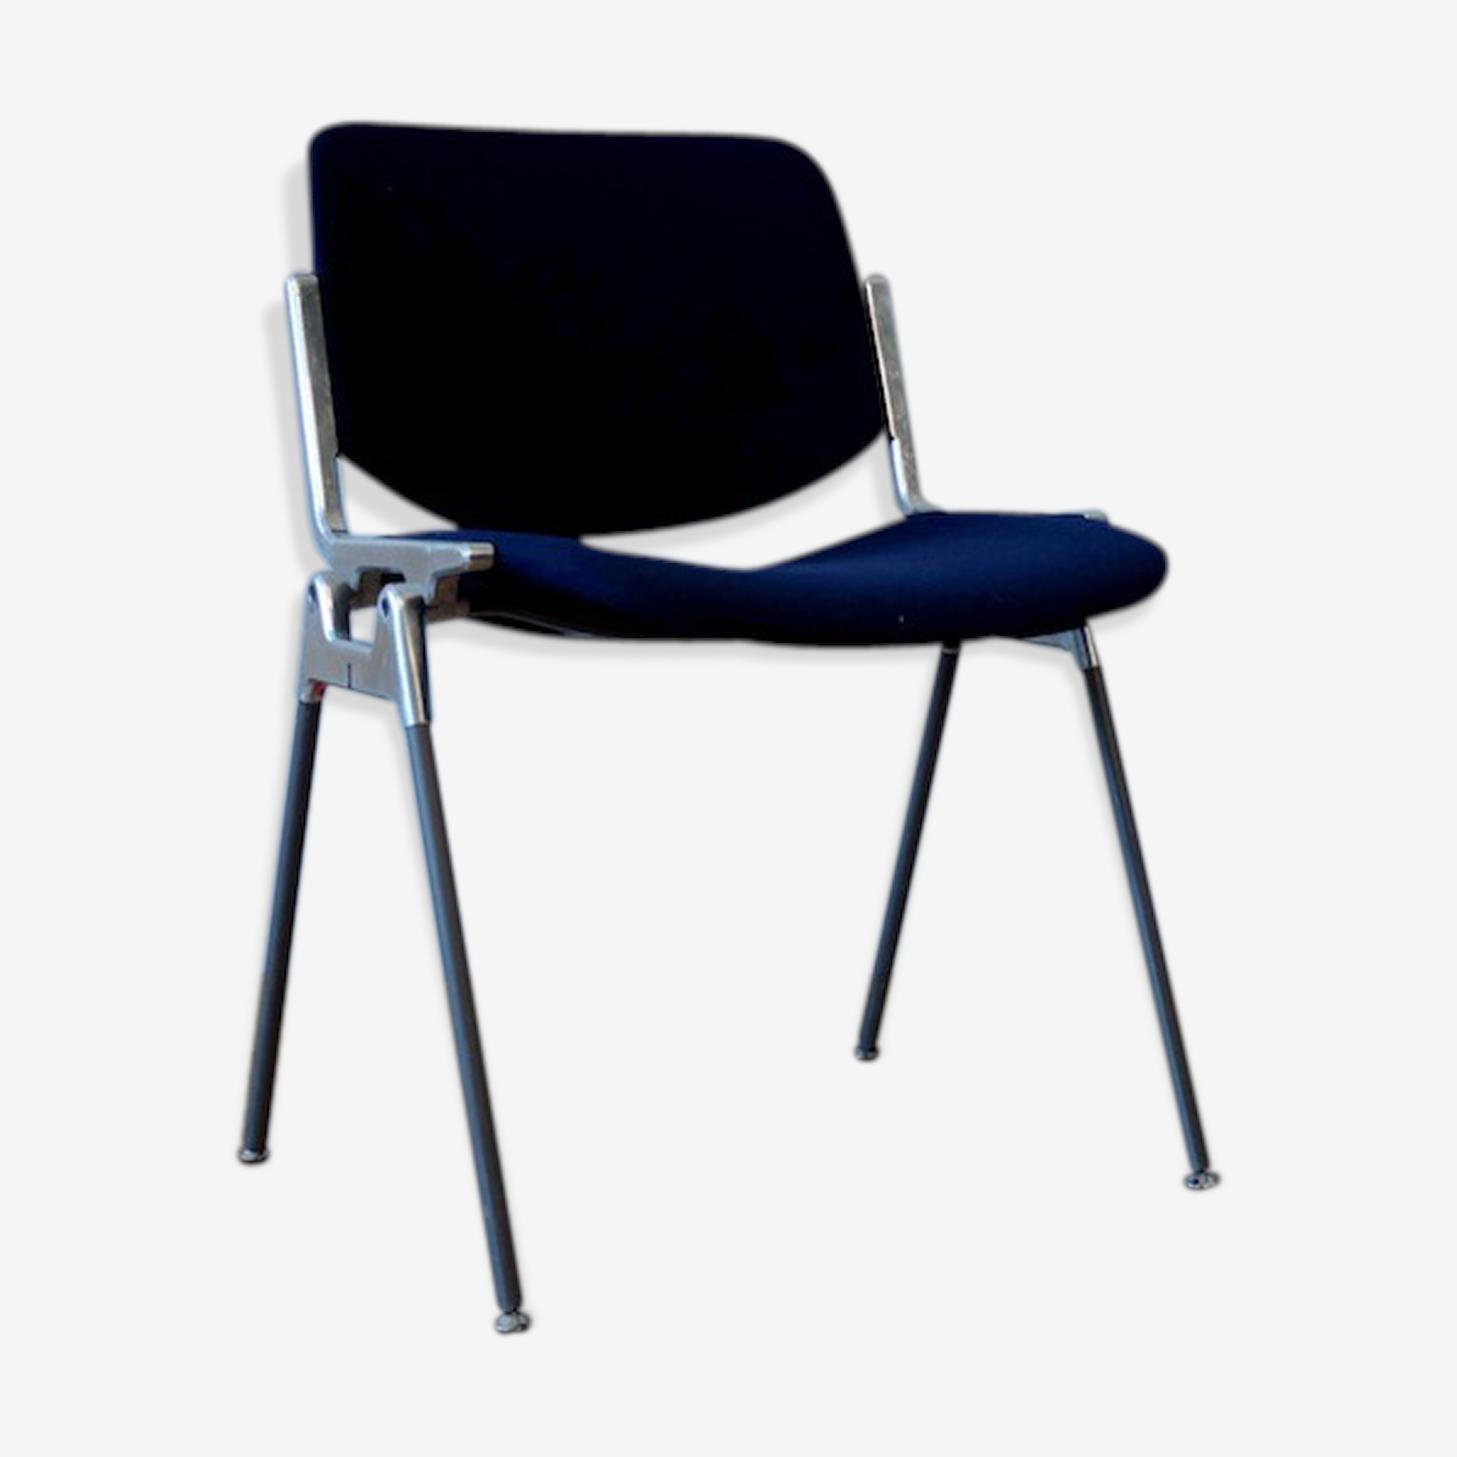 Chaise DSC 106 tissu bleu de G. Piretti pour Castelli - Circa 60